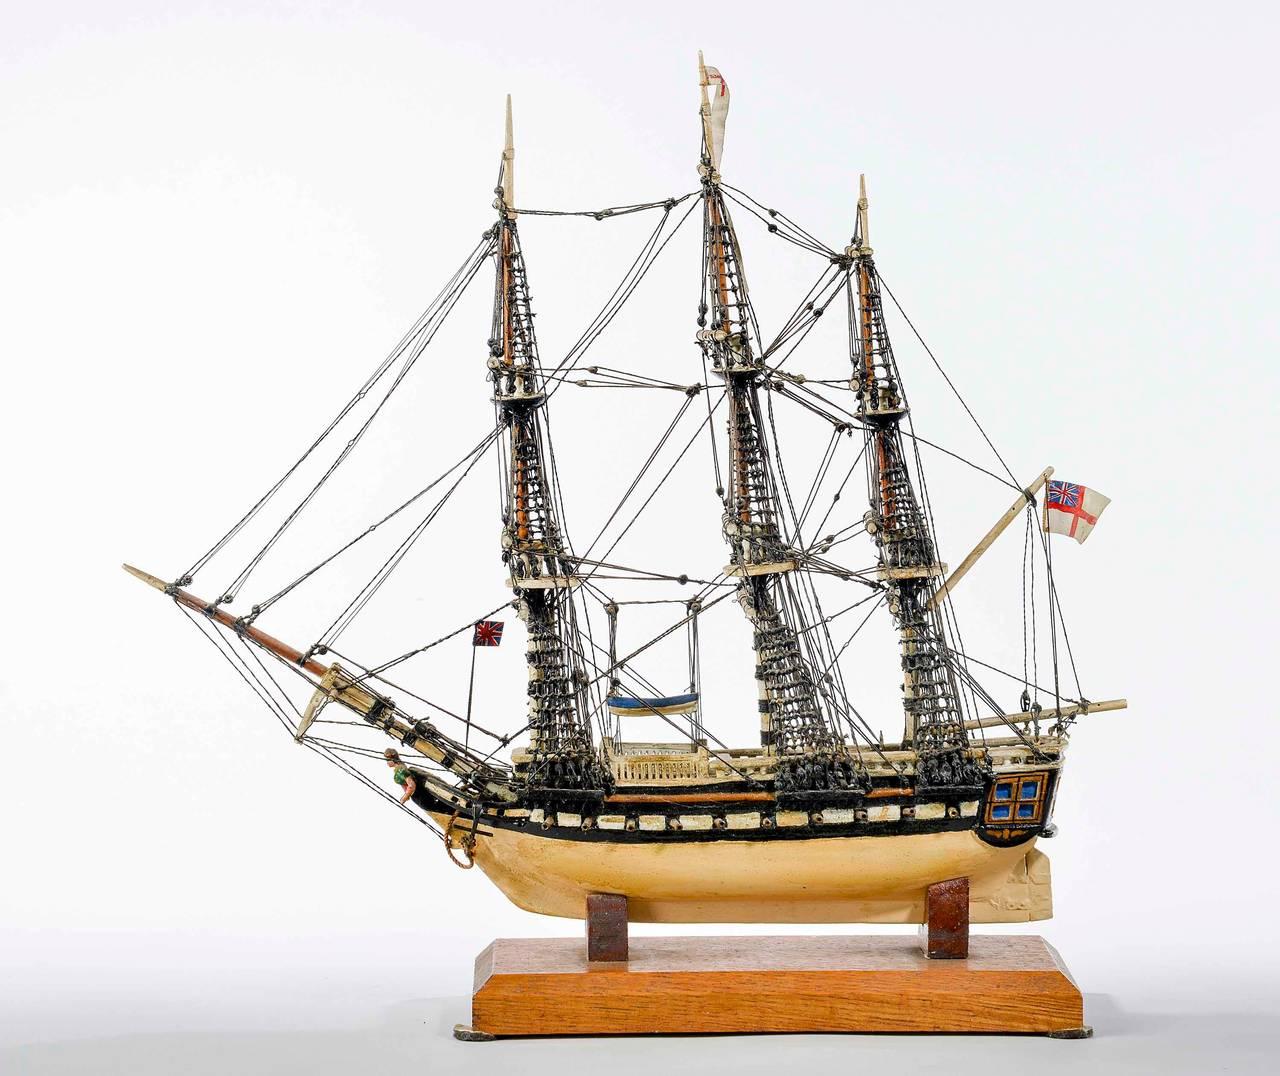 British Fine Mid-20th Century Ship Model For Sale